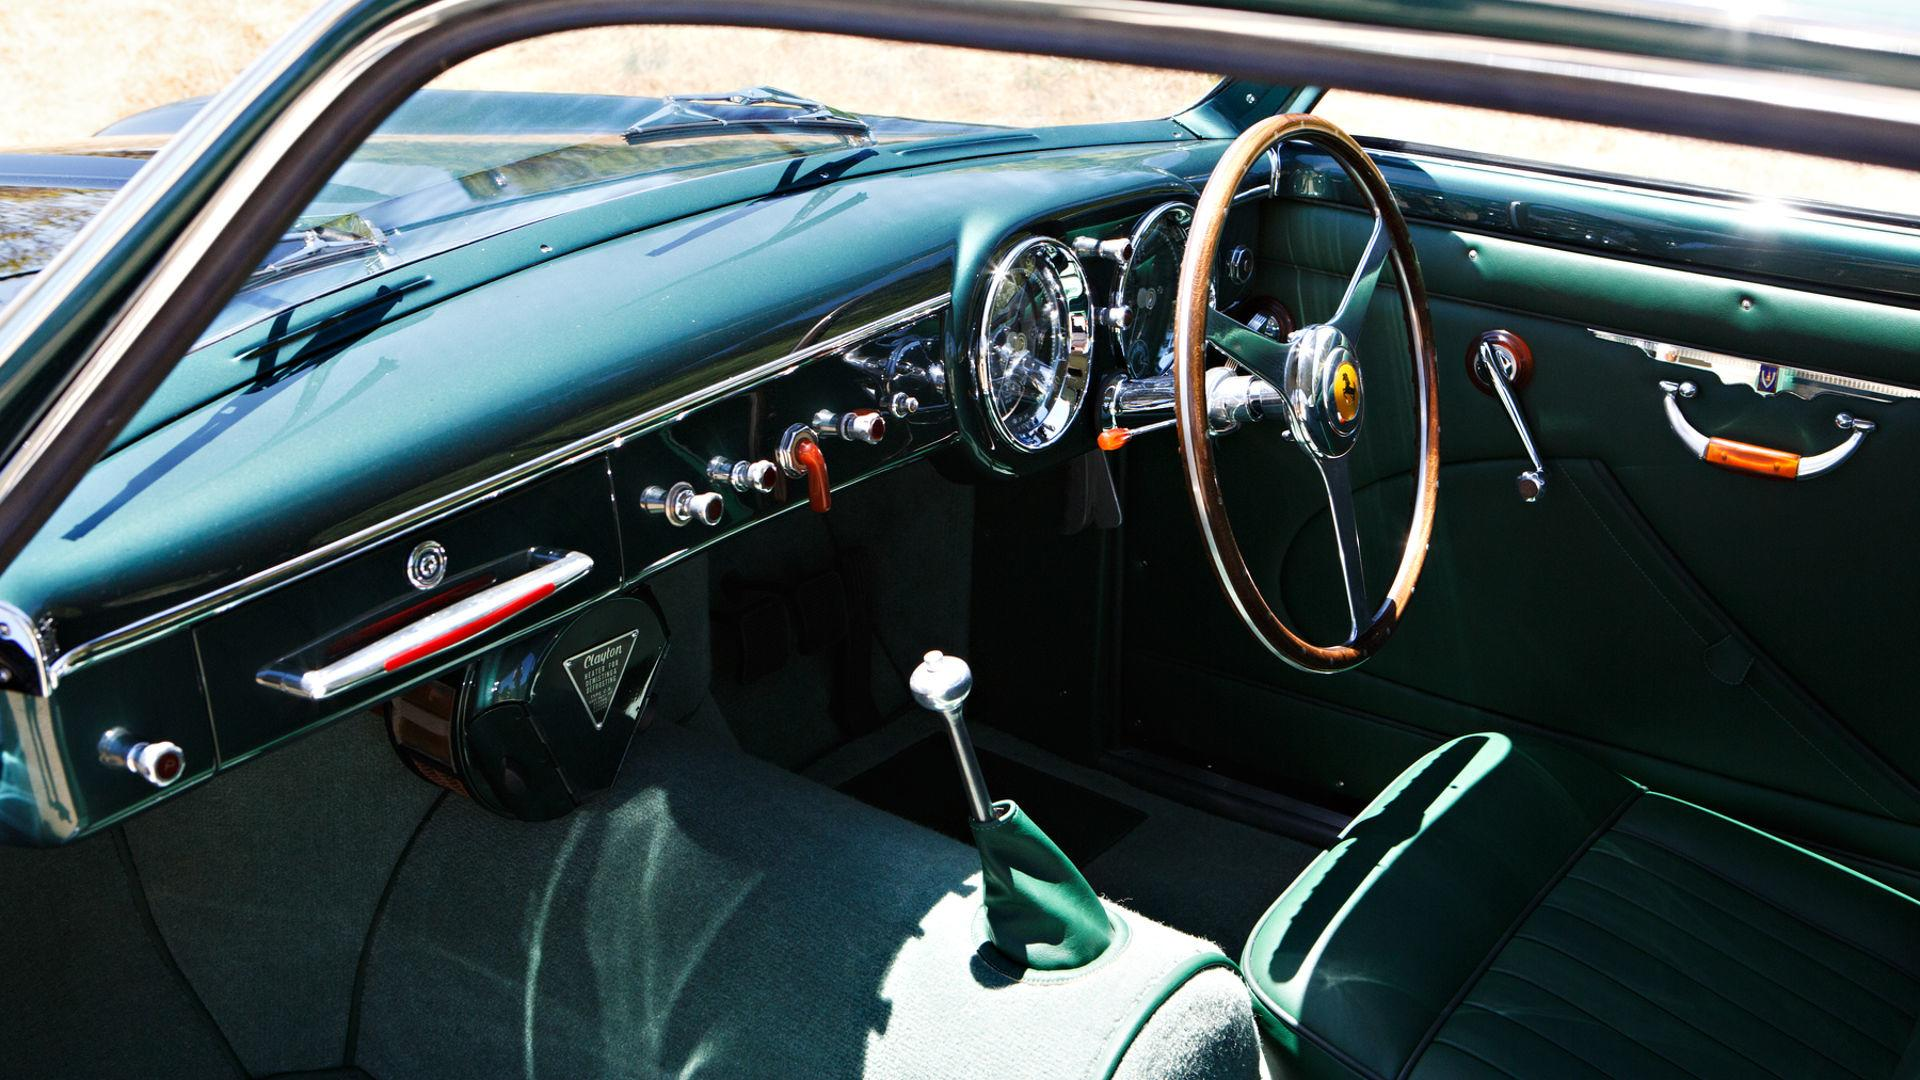 1951-ferrari-212-inter-coupe-copyright-gooding-company-brian-henniker (2)